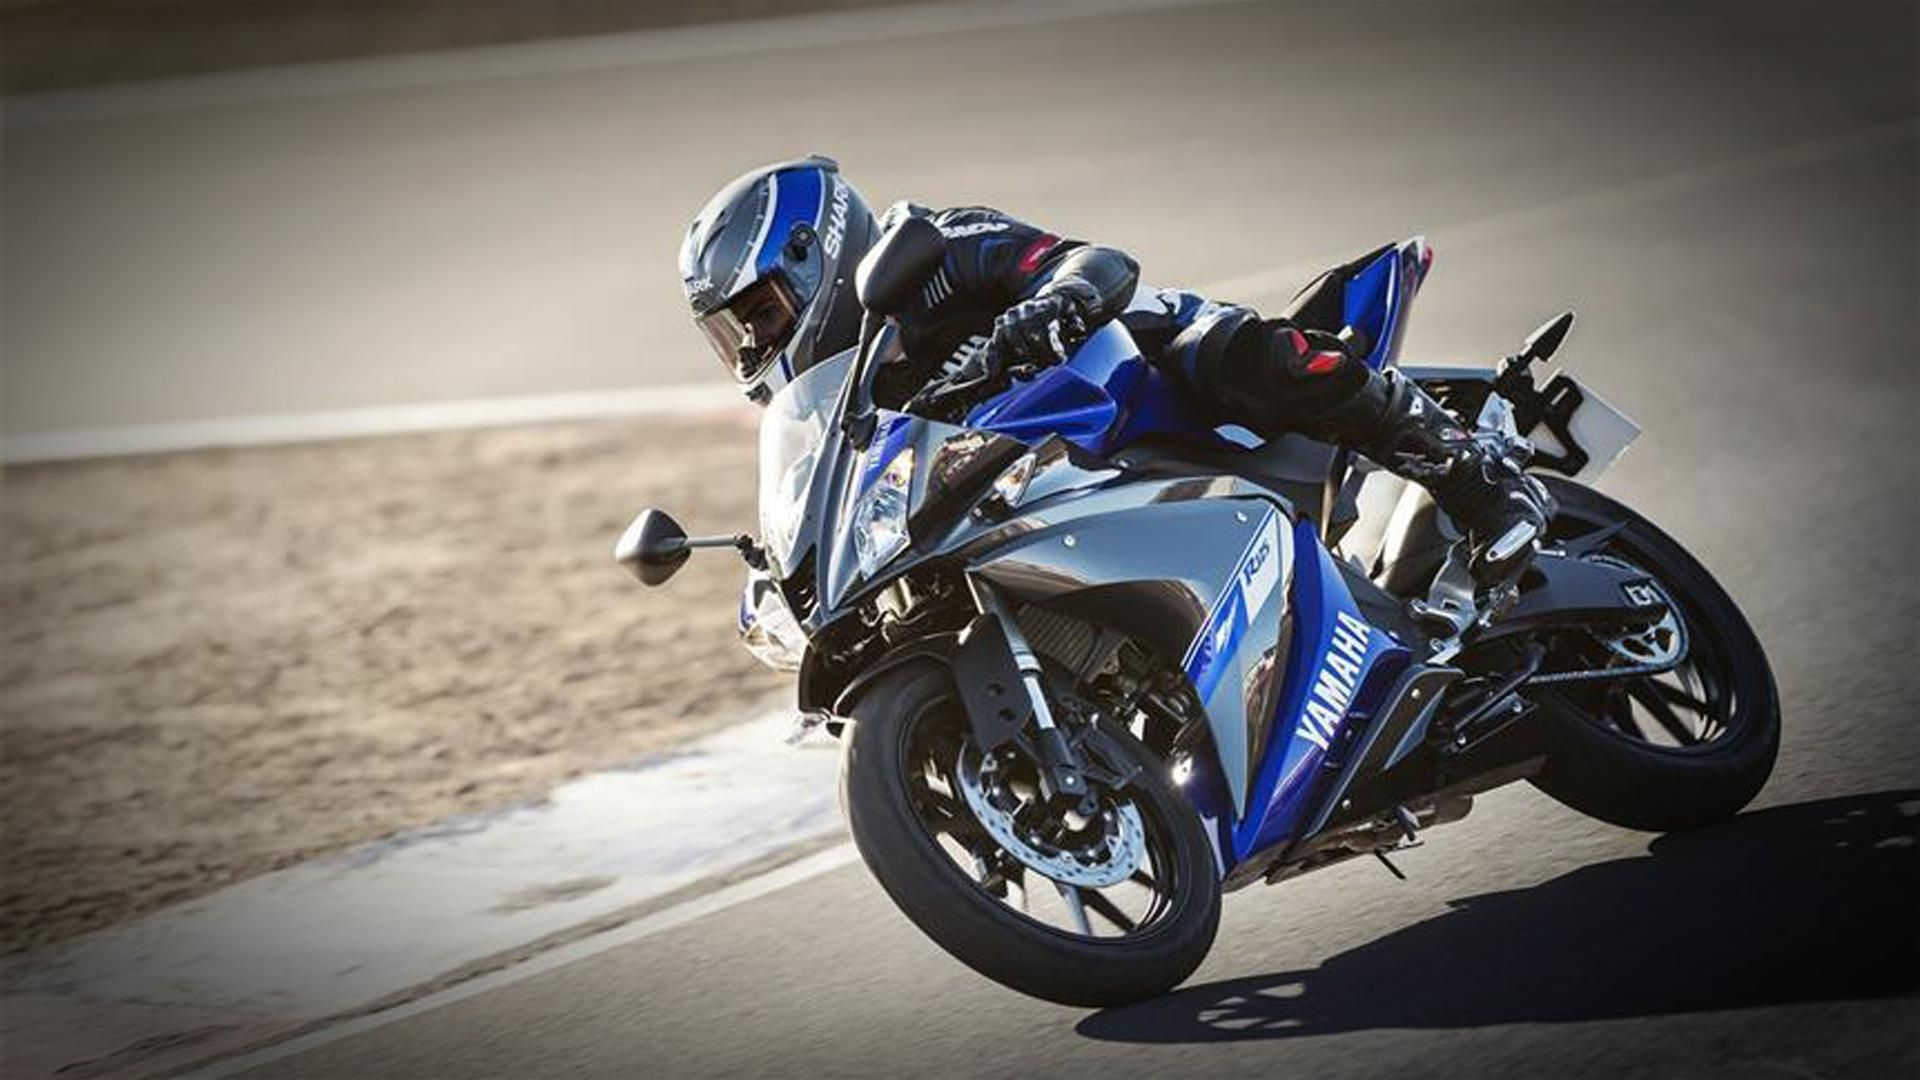 Yamaha yzf r125 usata moto usate 2016 car release date - Yamaha R125 Bike 2014 Yamaha Yzf R125 Liquid Cooled 4 Stroke Single Cylinder Engine